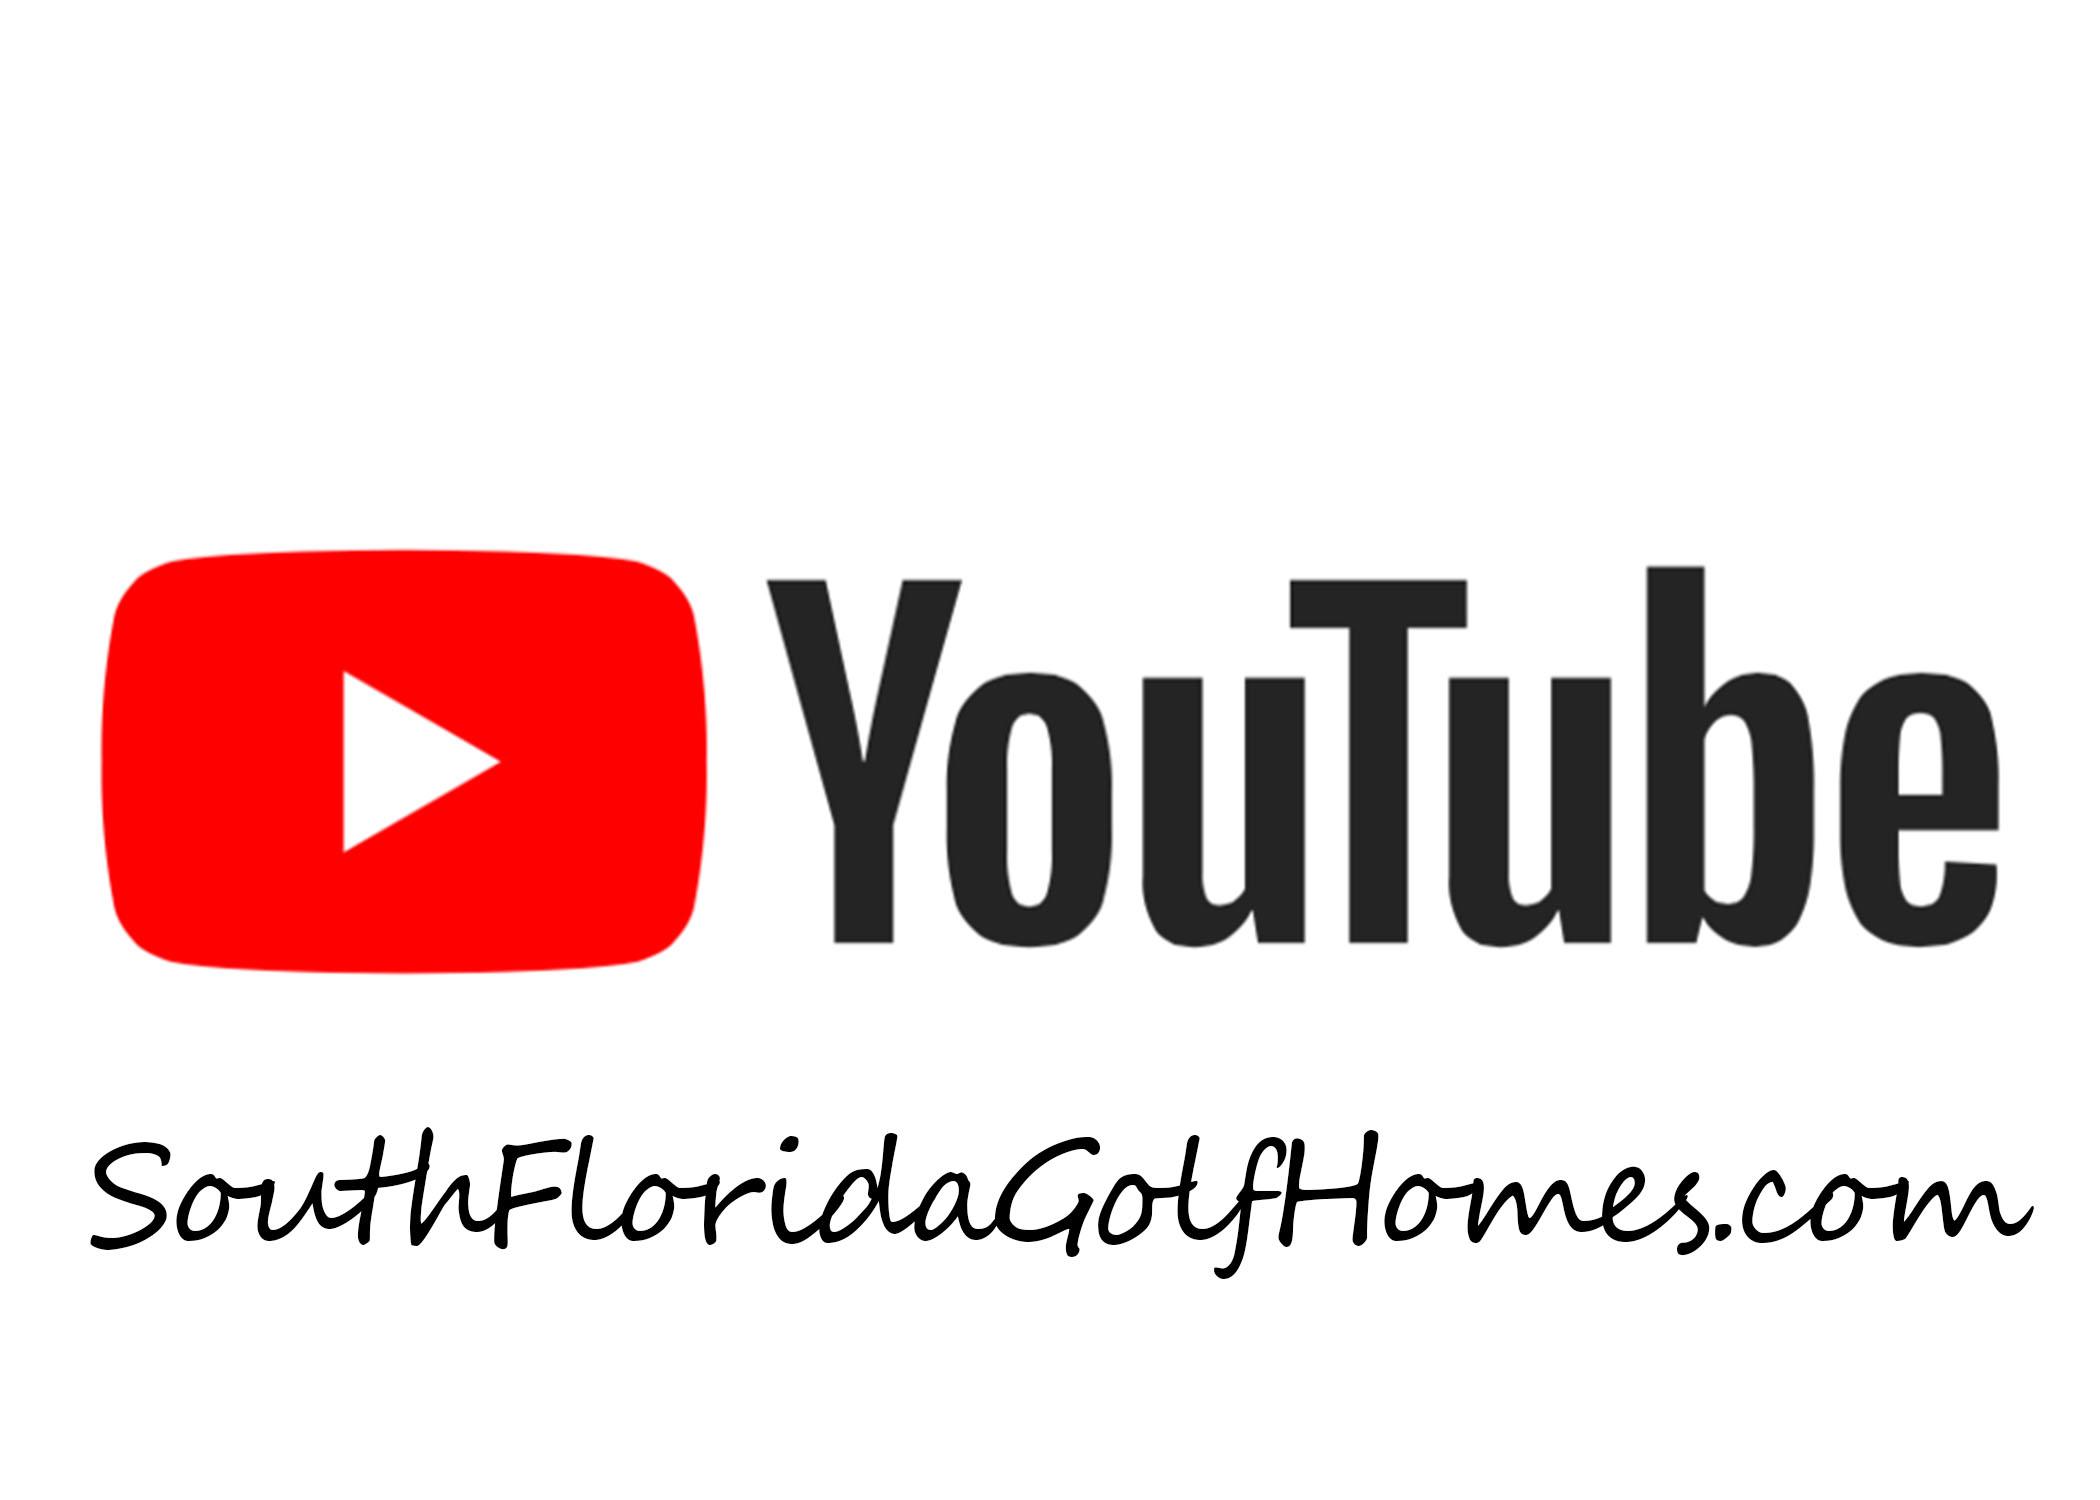 South Florida Golf Homes Video